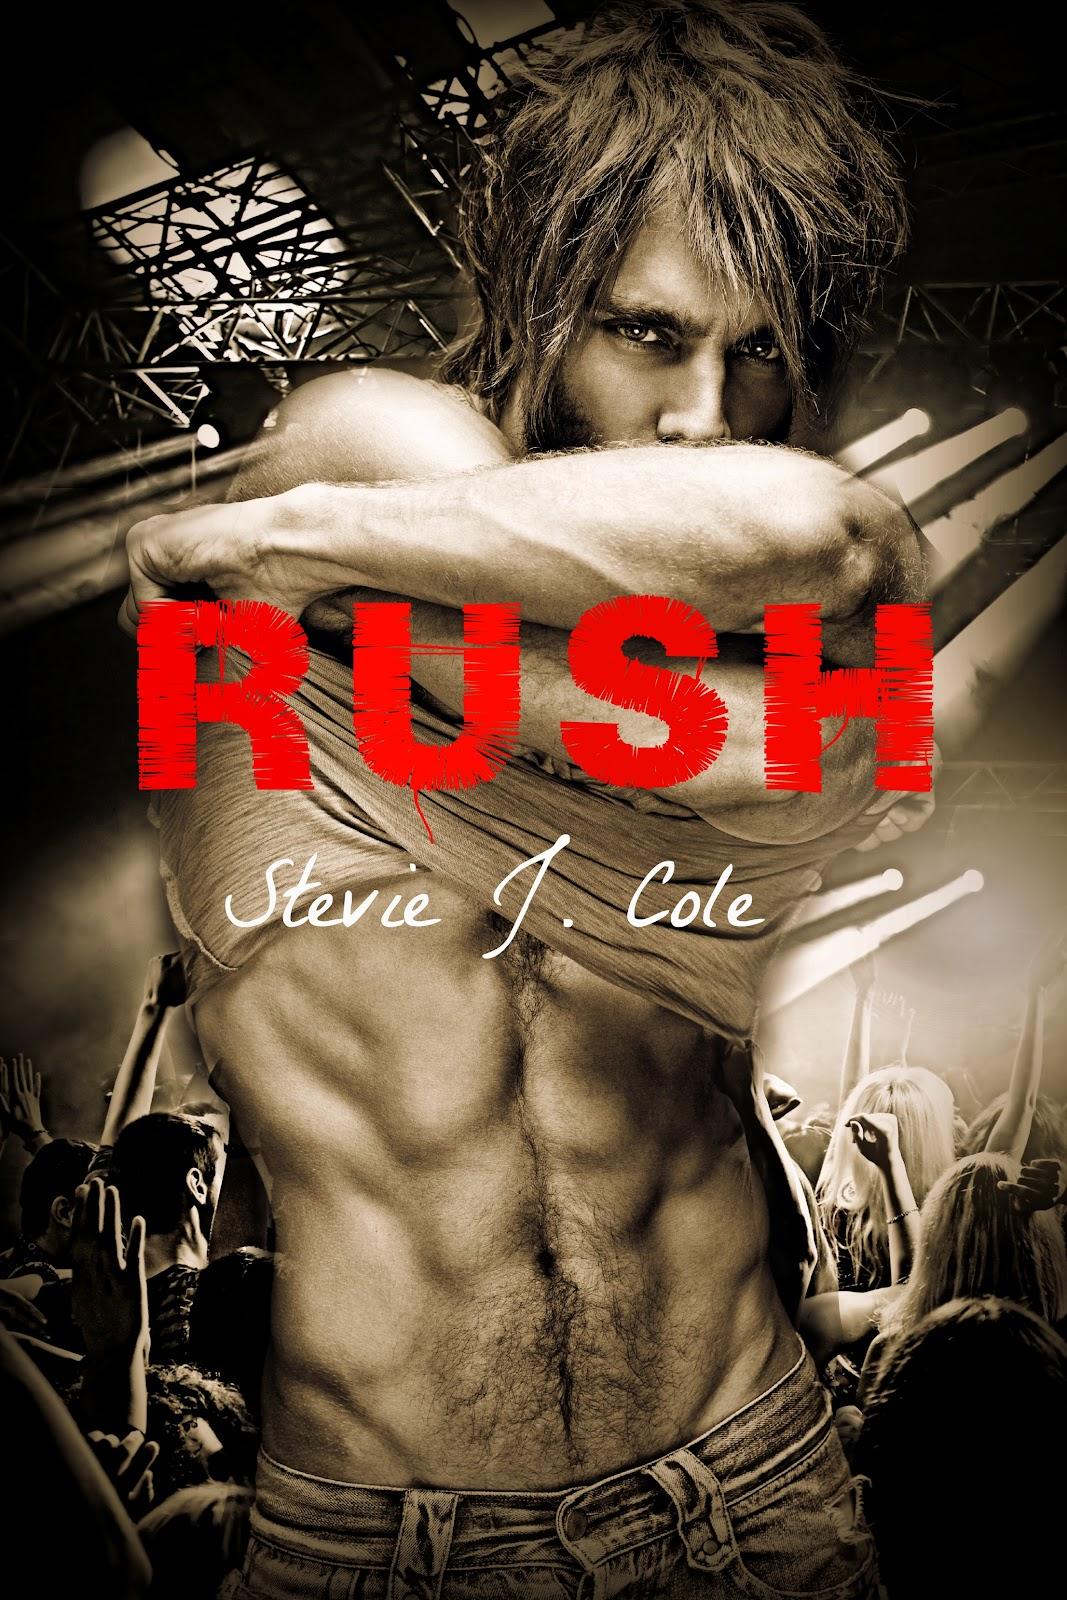 rush cover ebook.jpg